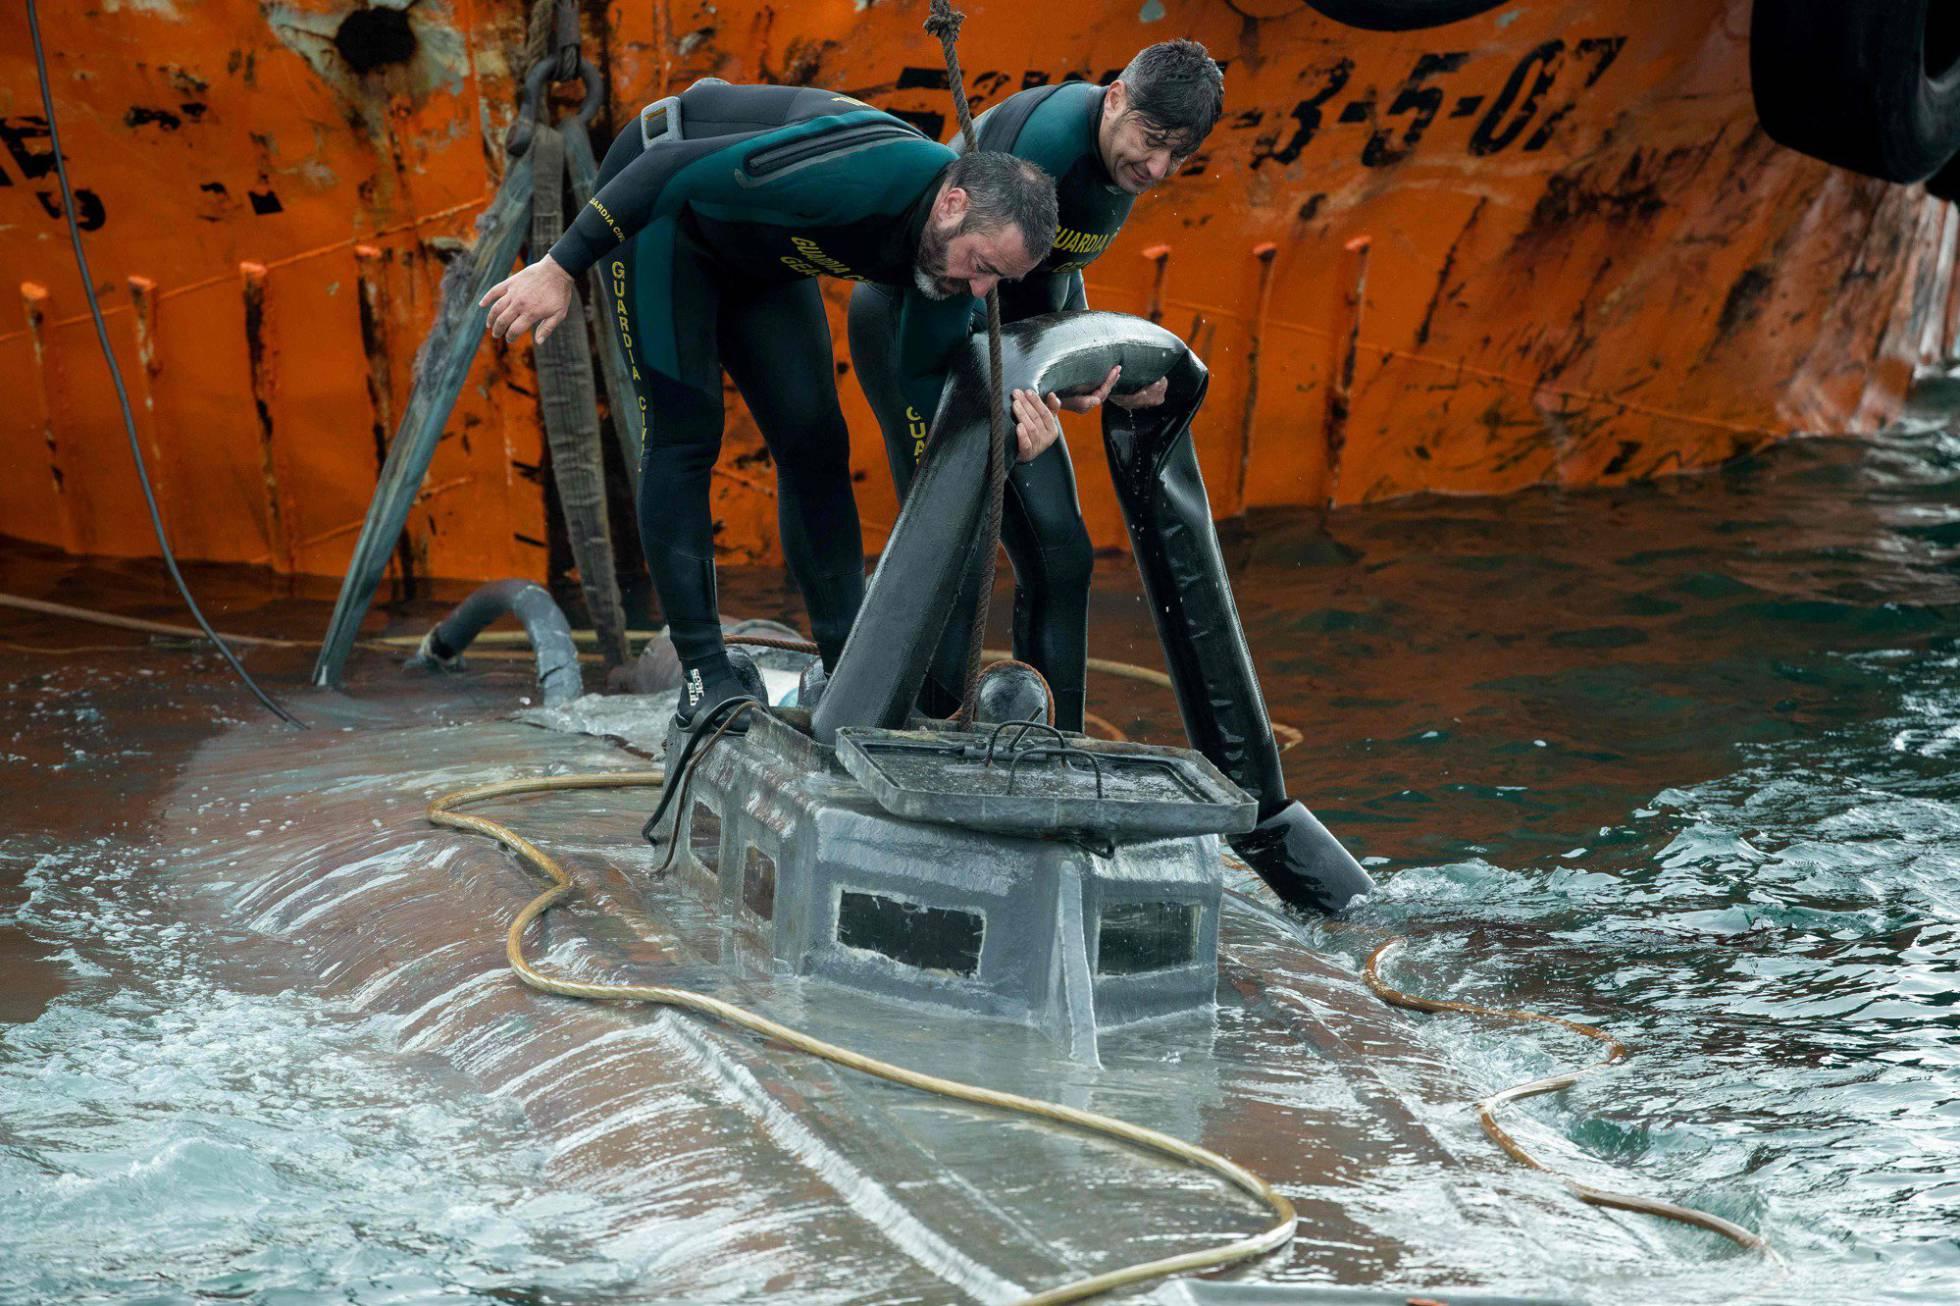 Испанская полиция изъяла более трёх тонн кокаина на подводном судне